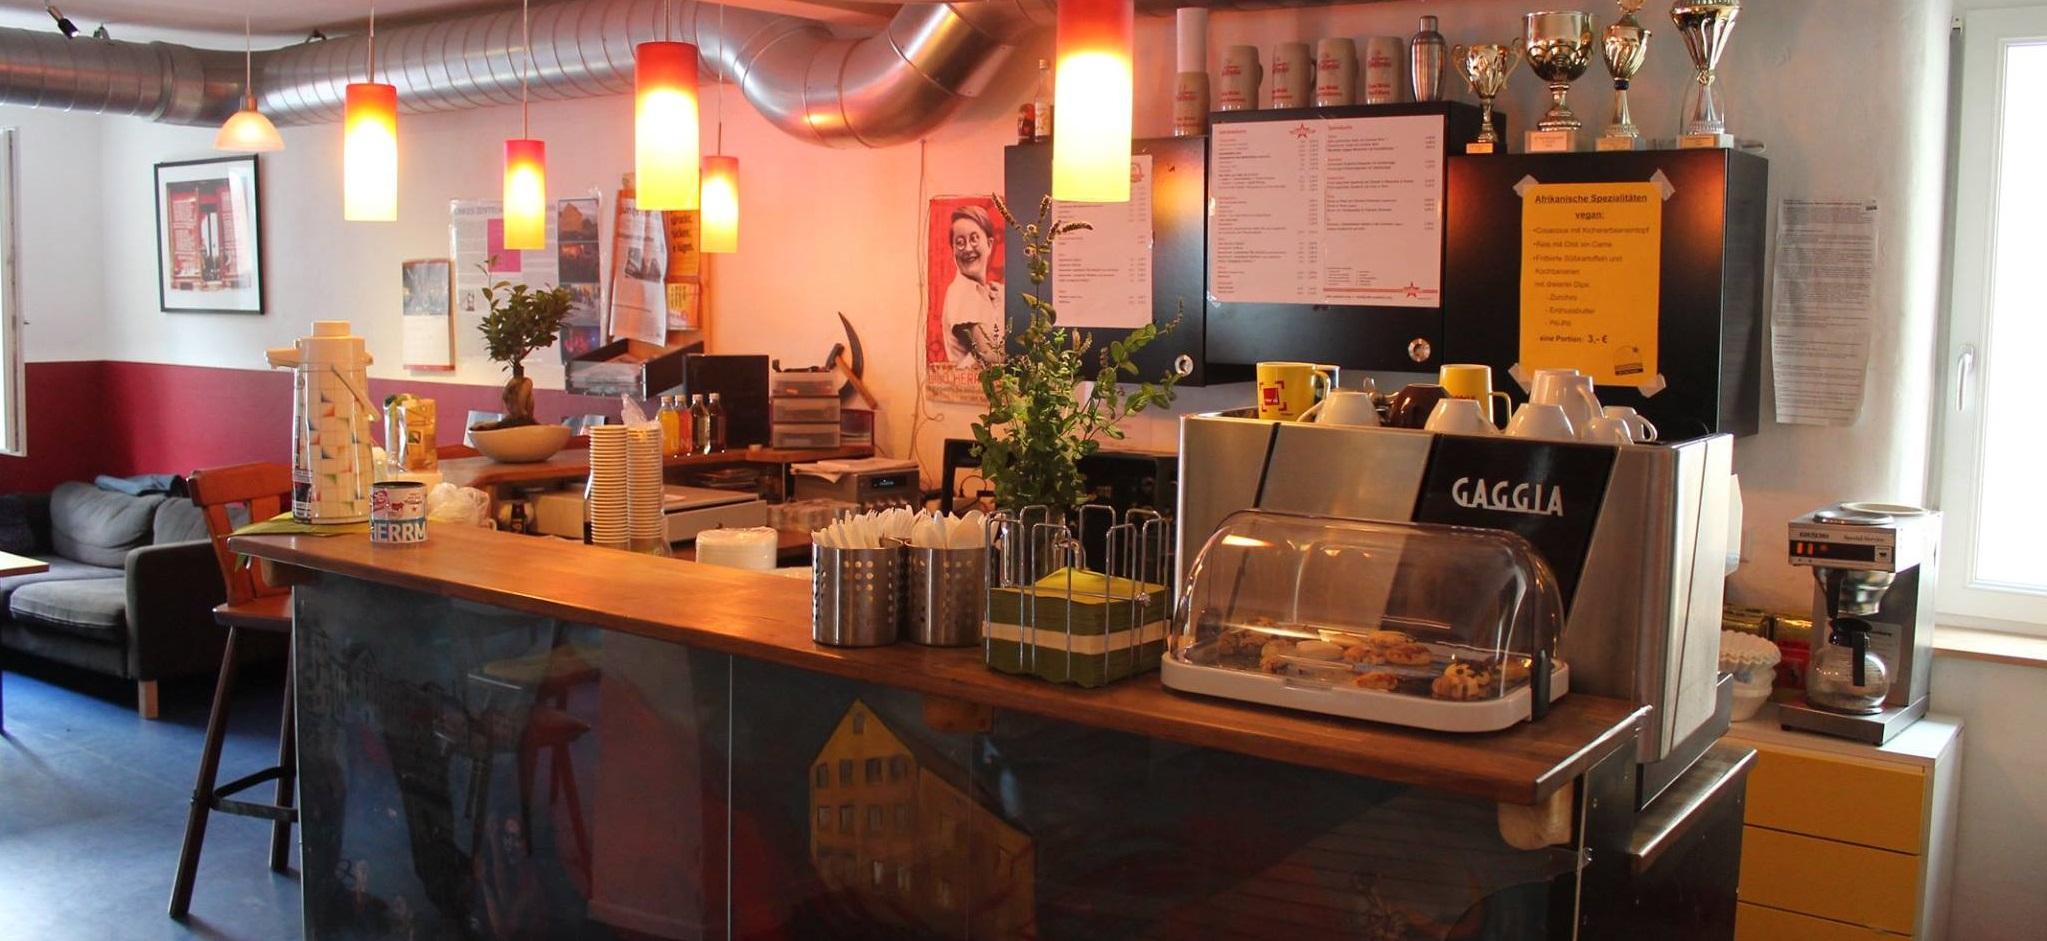 Theke Vom Cafe Sudstern Linkes Zentrum Lilo Herrmann